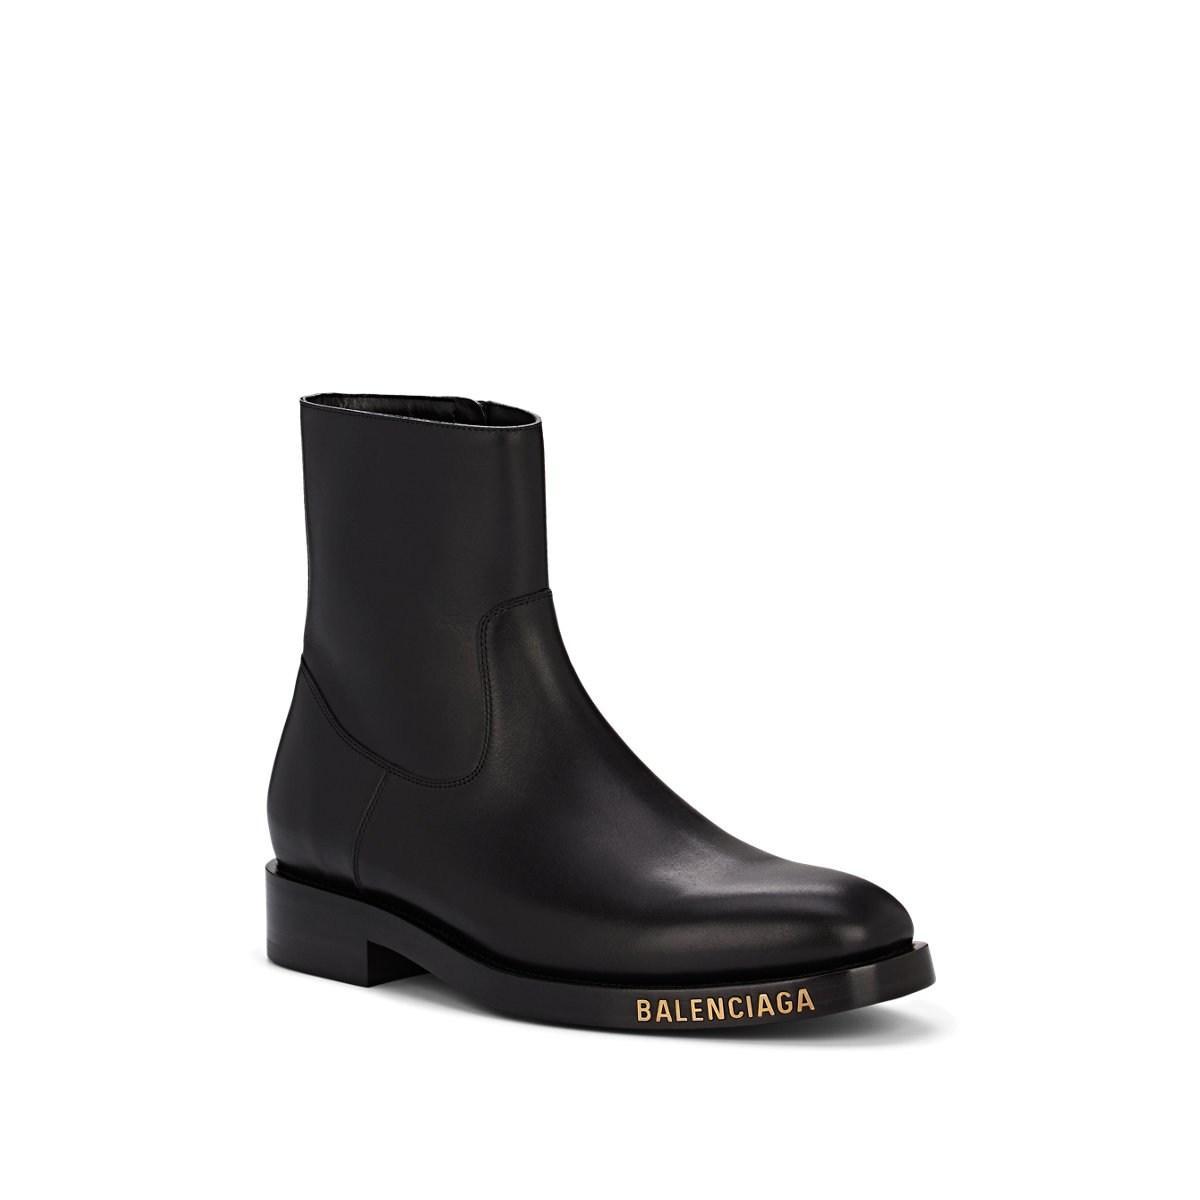 71ce9457e4fa3 Balenciaga - Black Logo Leather Boots for Men - Lyst. View fullscreen